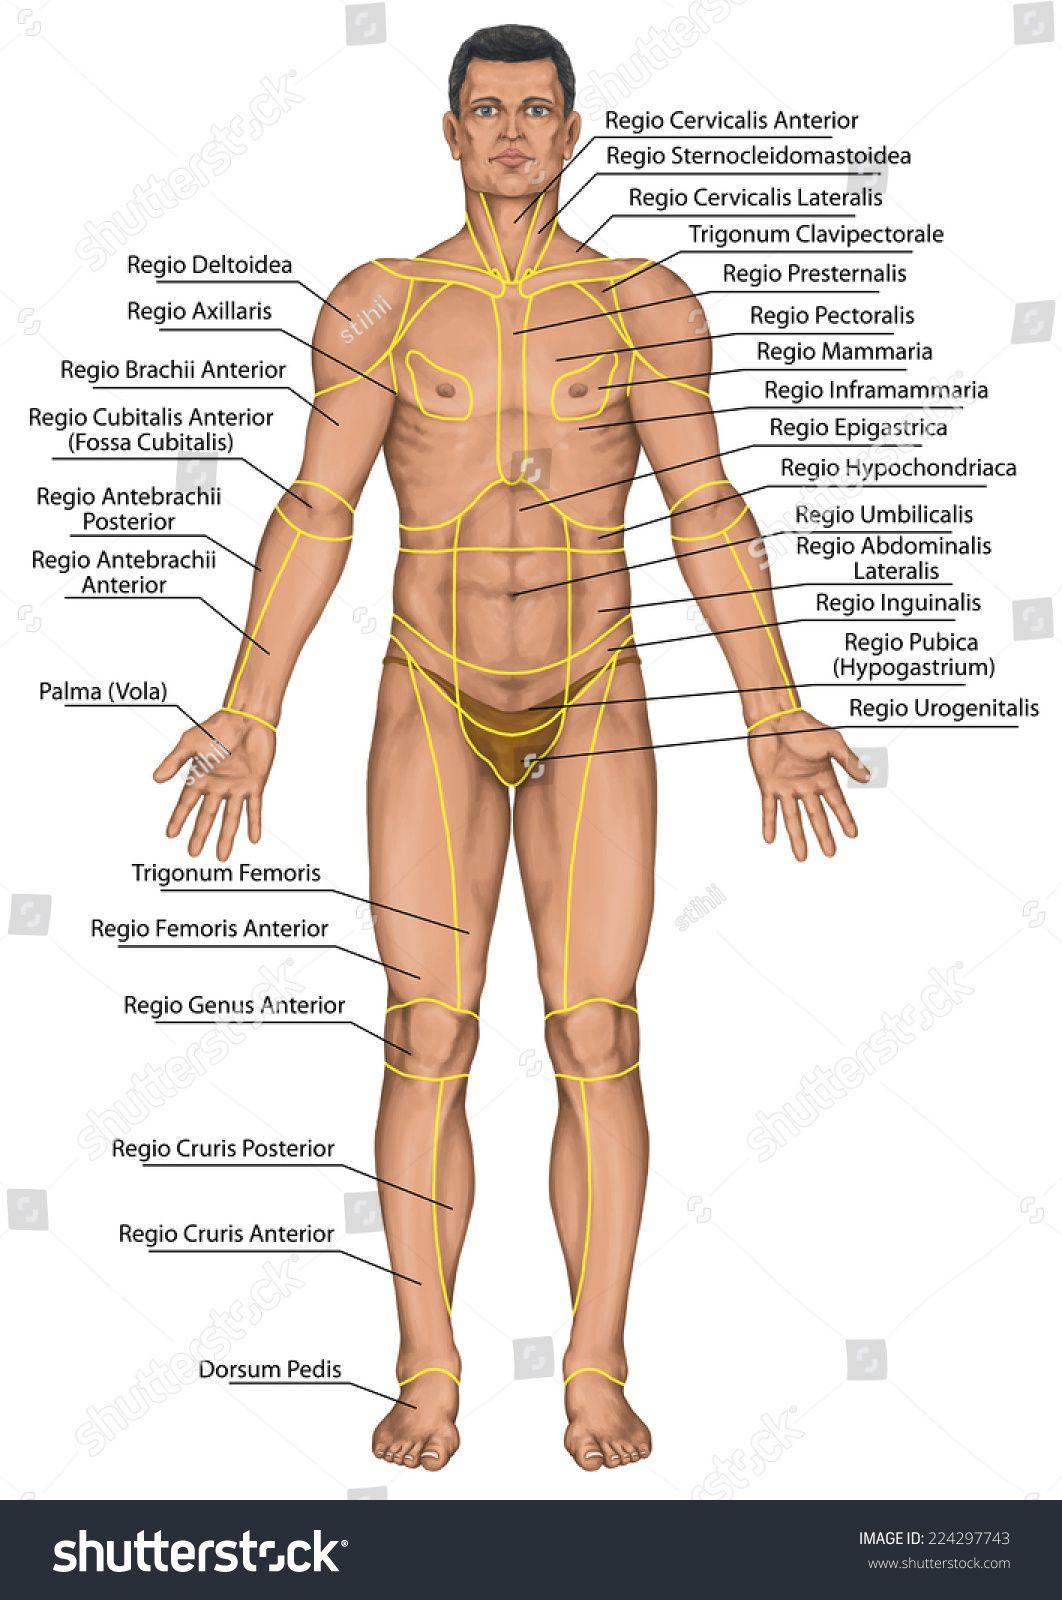 Anatomy Human Body School Human Body Human Body Systems Body